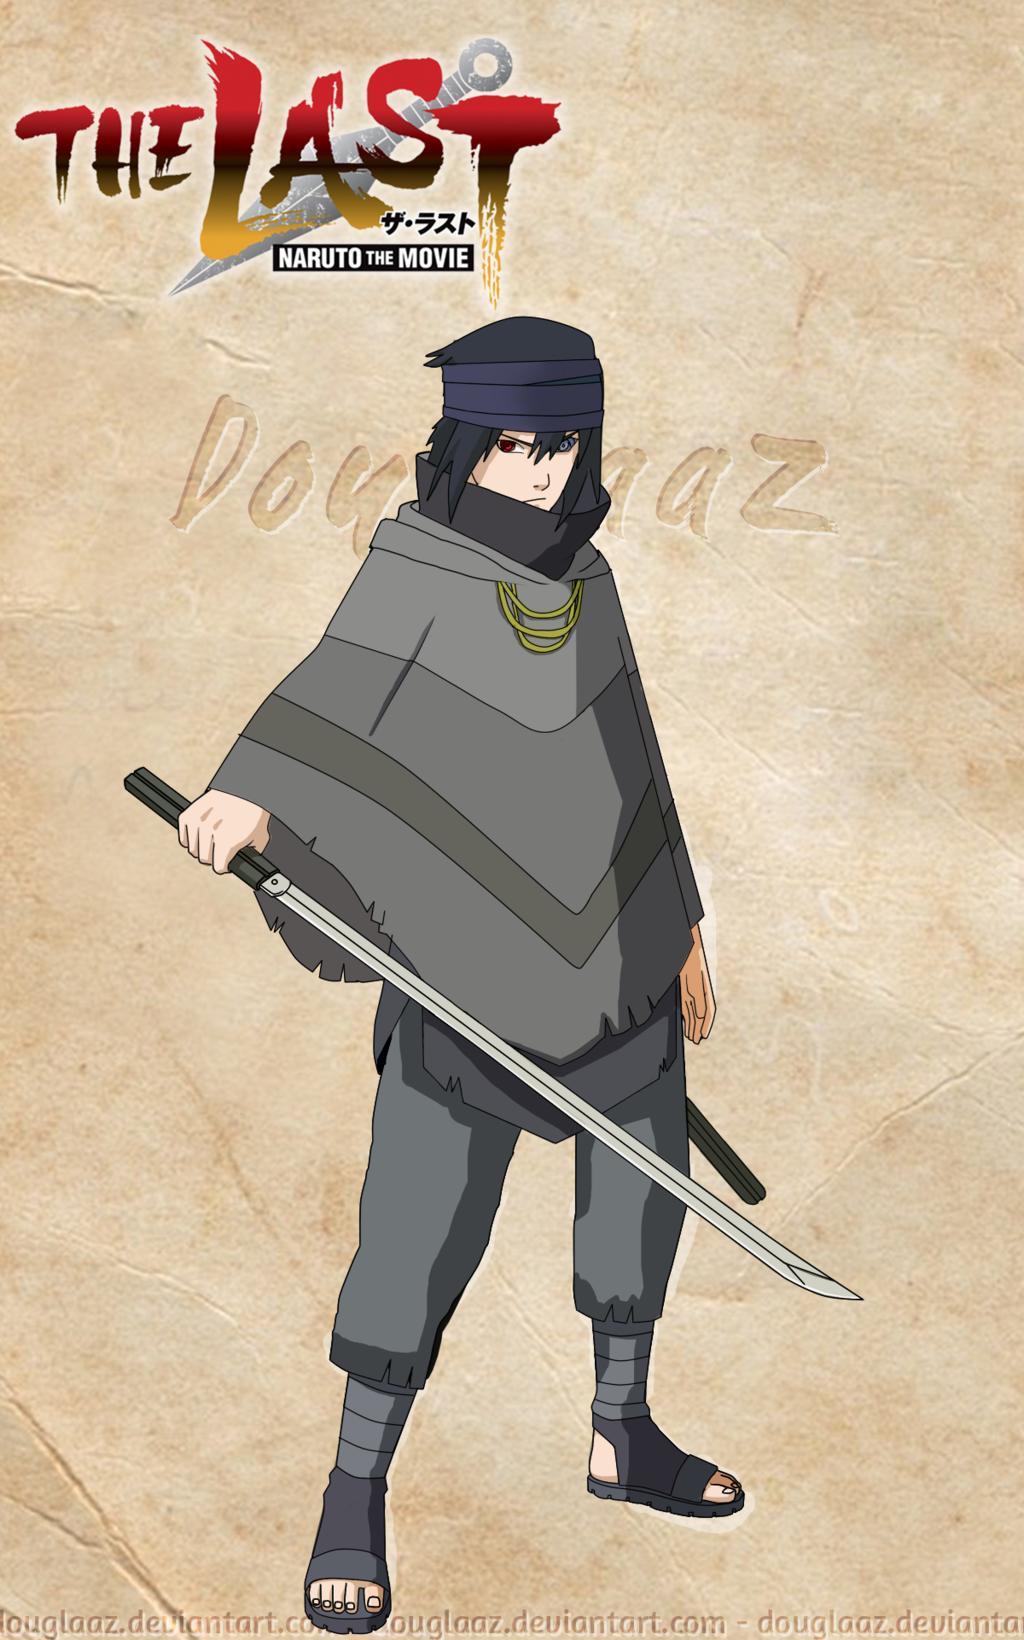 Sasuke   The Last Naruto the Movie by douglaaz 1024x1640